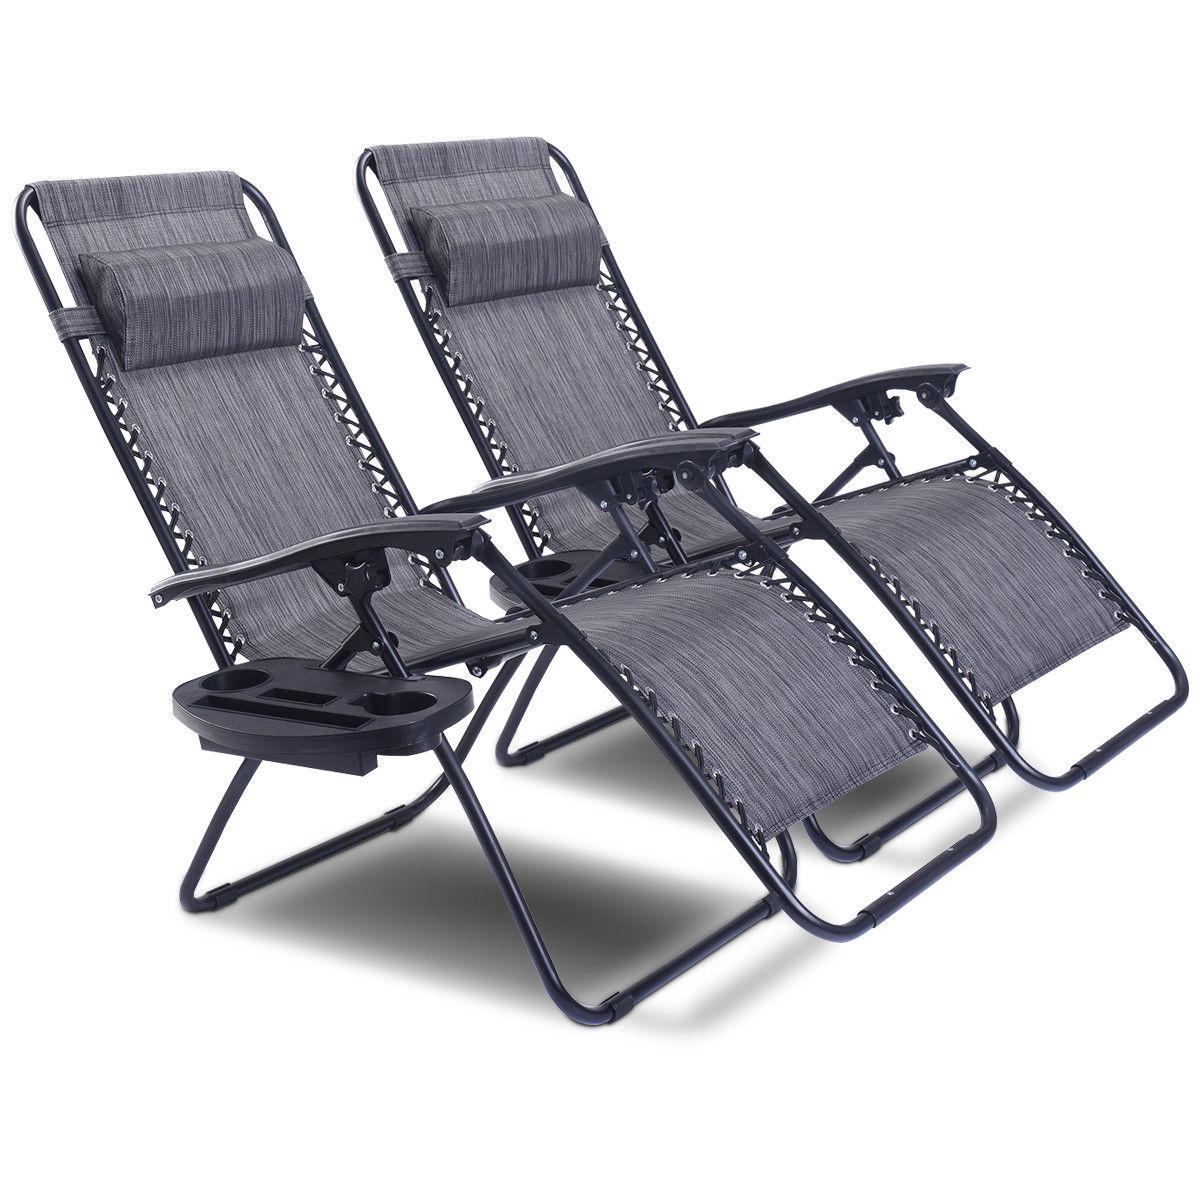 2PC Folding Zero Gravity Reclining Lounge Chairs Beach Patio W/ Utility Tray - image 1 of 8